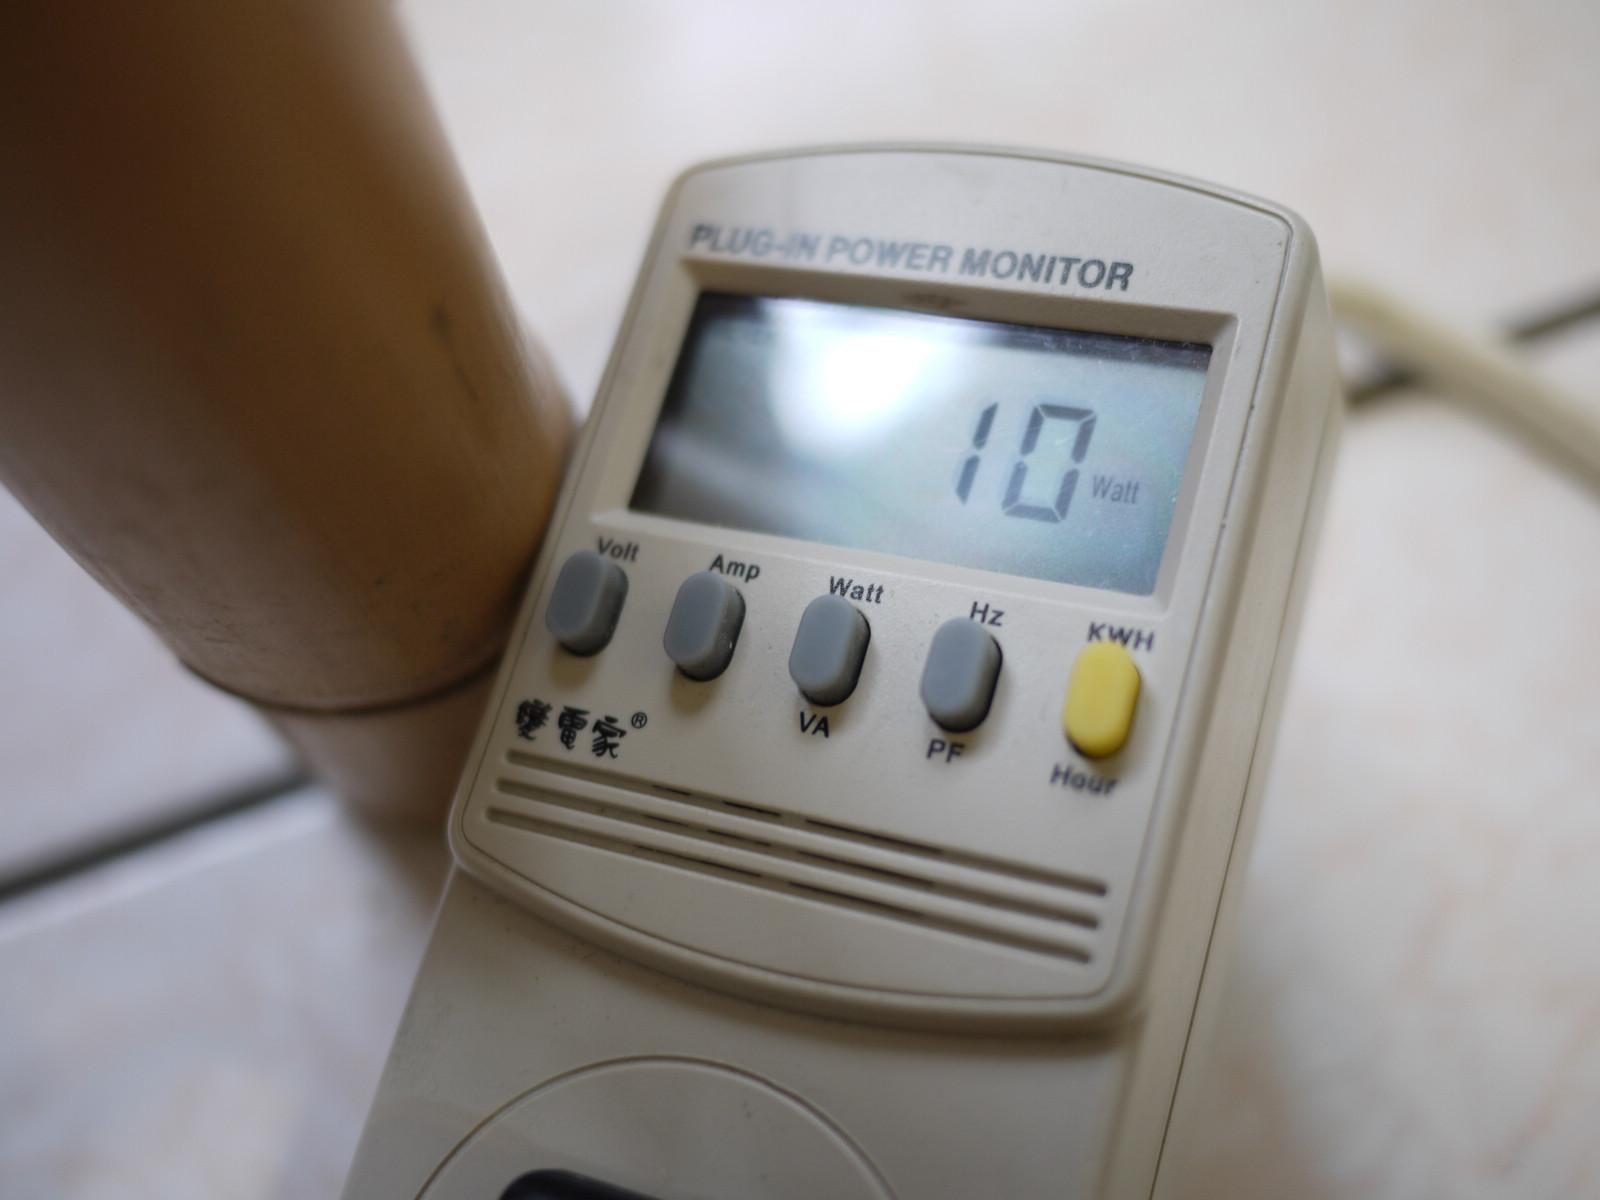 P1050911.JPG